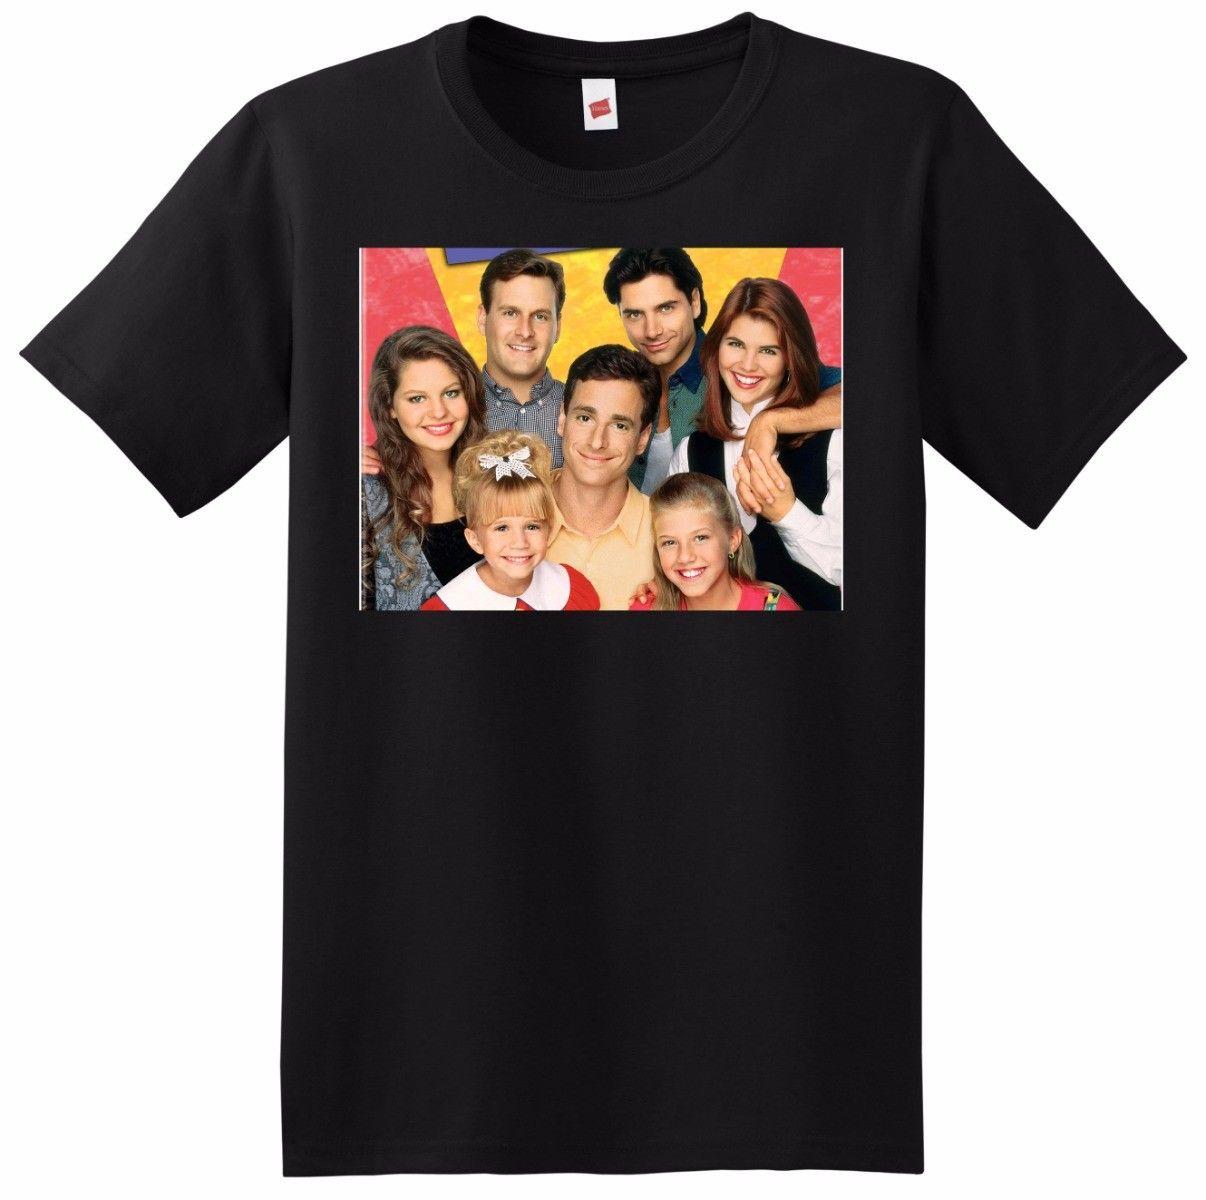 Buy 7 xl t shirts and get free shipping on AliExpress.com 3c0d4f79b751